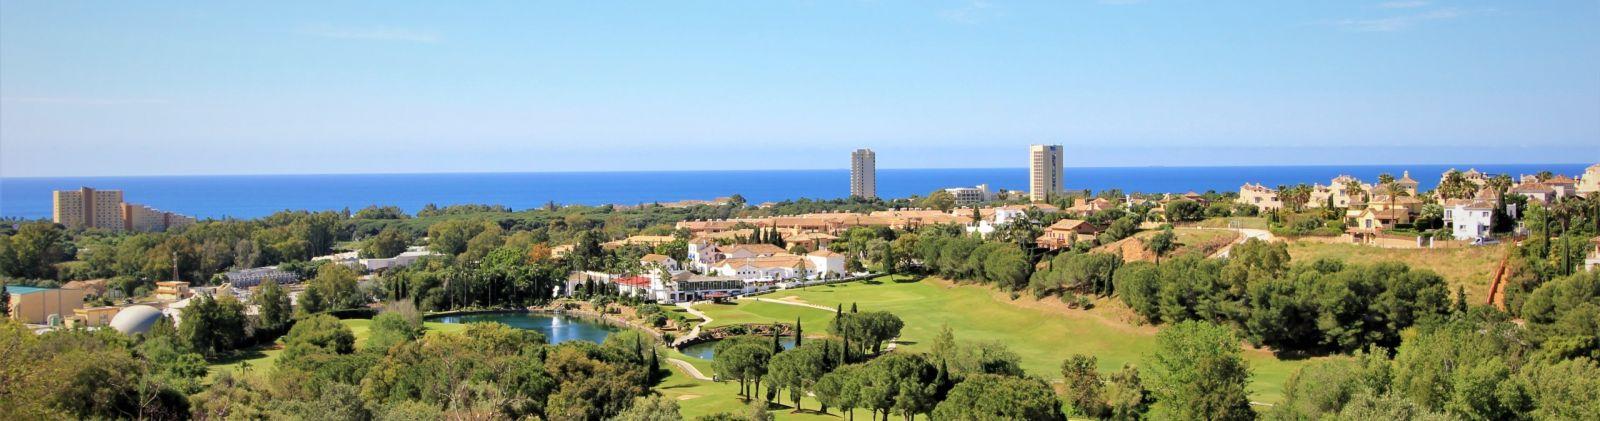 Heaven Marbella Elviria Your Move Spain